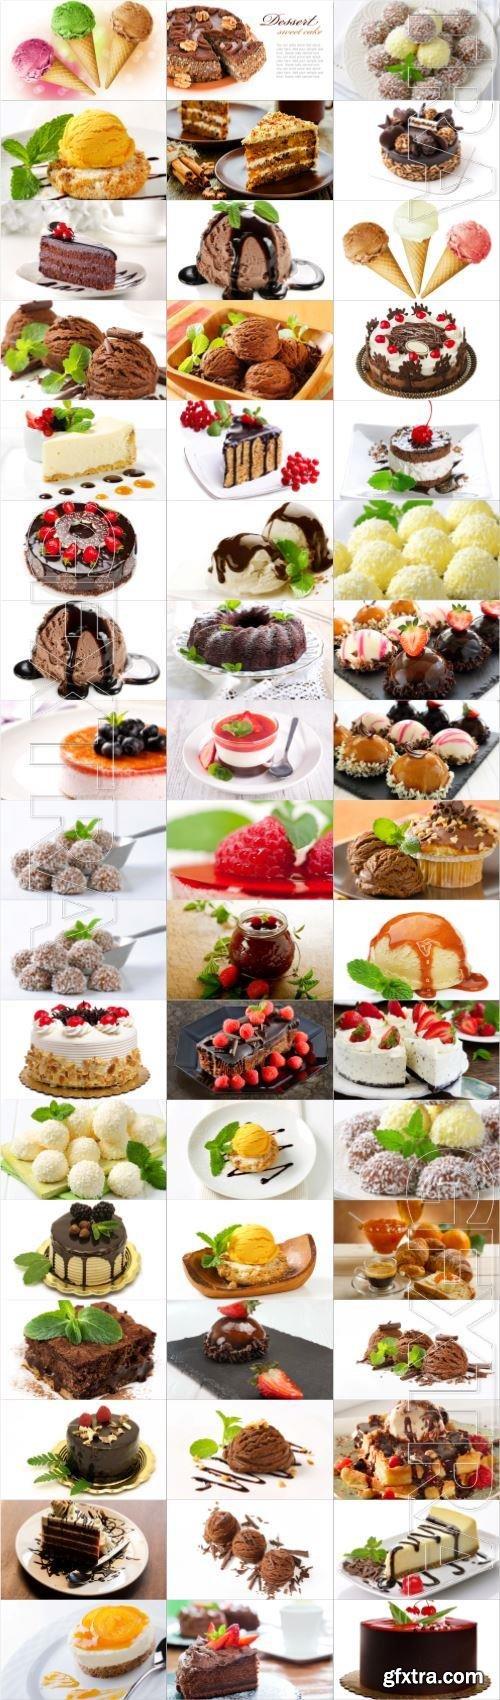 Desserts large selection stock photos